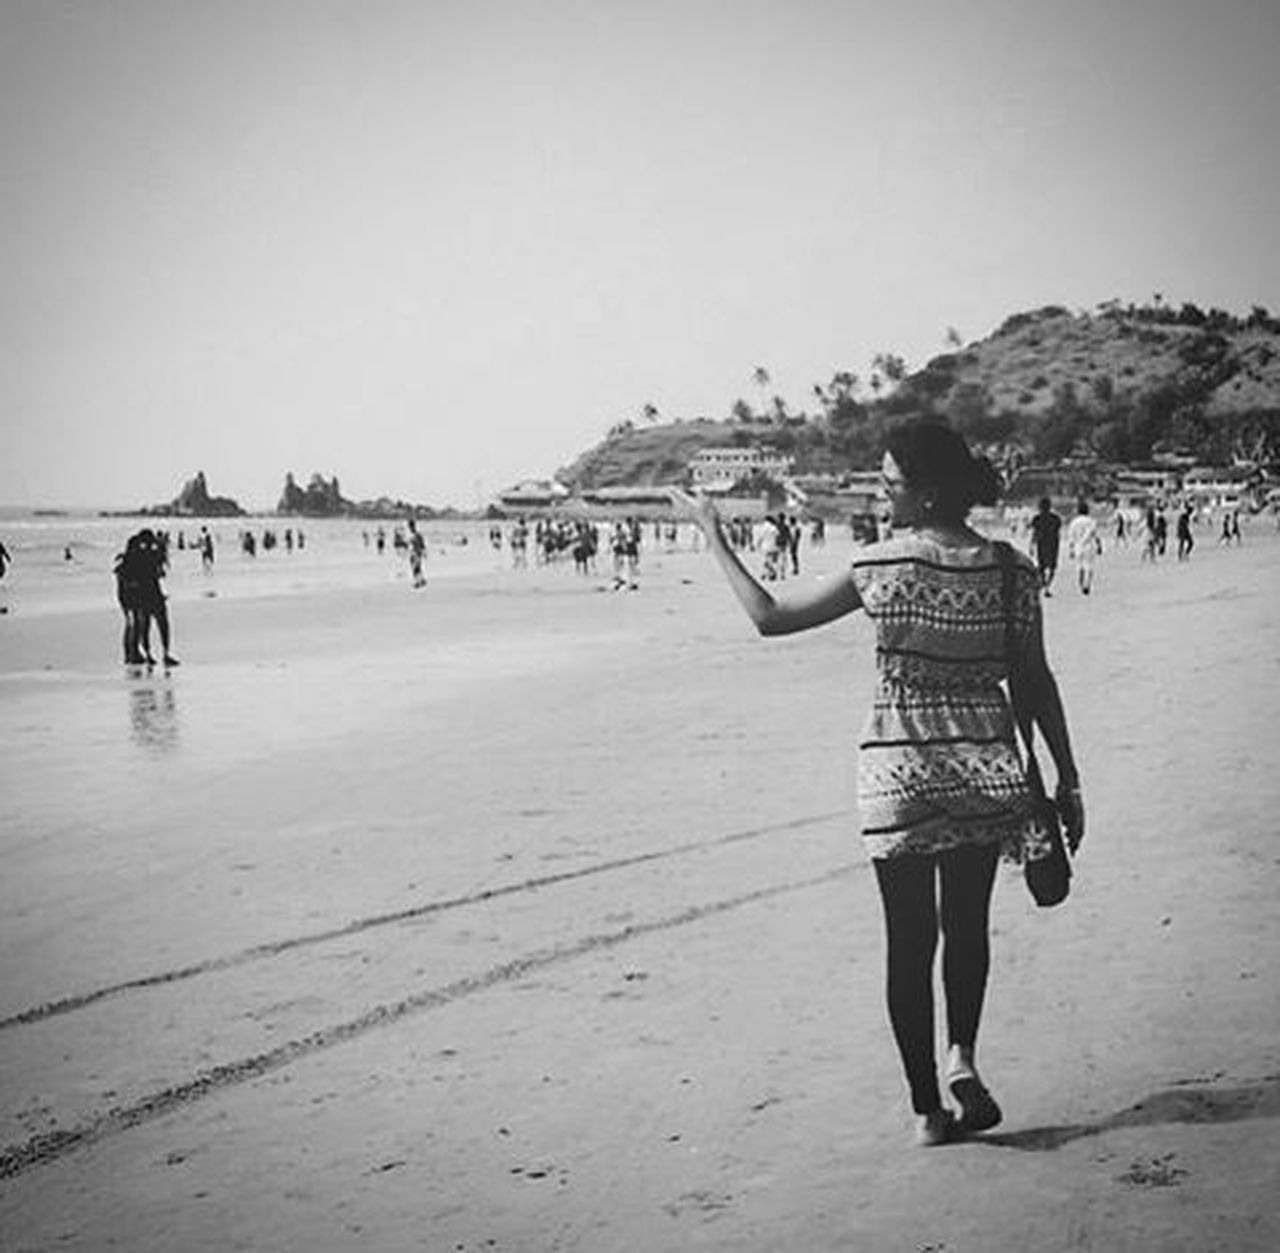 ☀☀☀☀☀☀ 🌴🌴🌴🌴🌴🌴 🏊🏄🏊🏊🏄🏊 🐳🐬🐳🐬🐳🐬 LOL Thats Me Beach Sun Tree Rocks Palms Trip Water Sea Salt Fish Shell Happy Enjoy Frnd Click Black White Dress Mygoa Noon Walk Beachlife shack beachside watersports everyday post